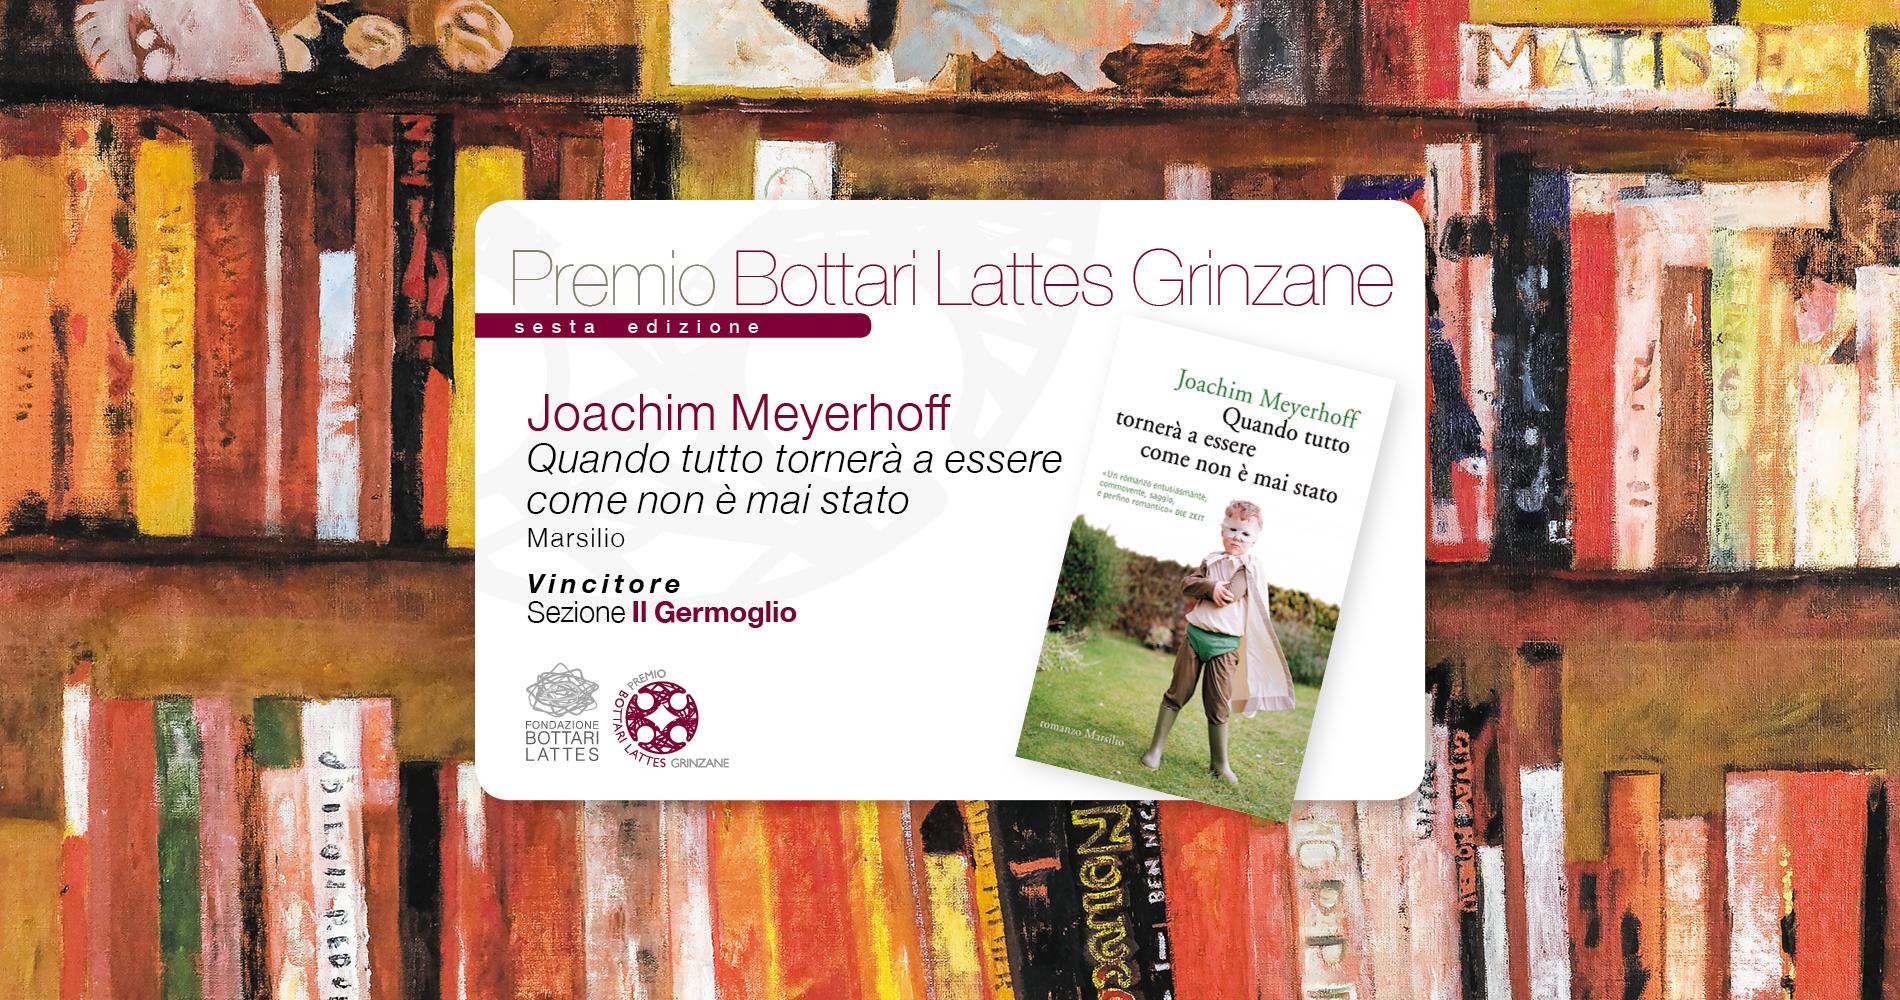 Joachim Meyerhoff   Vincitore del Premio Bottari Lattes Grinzane 2016